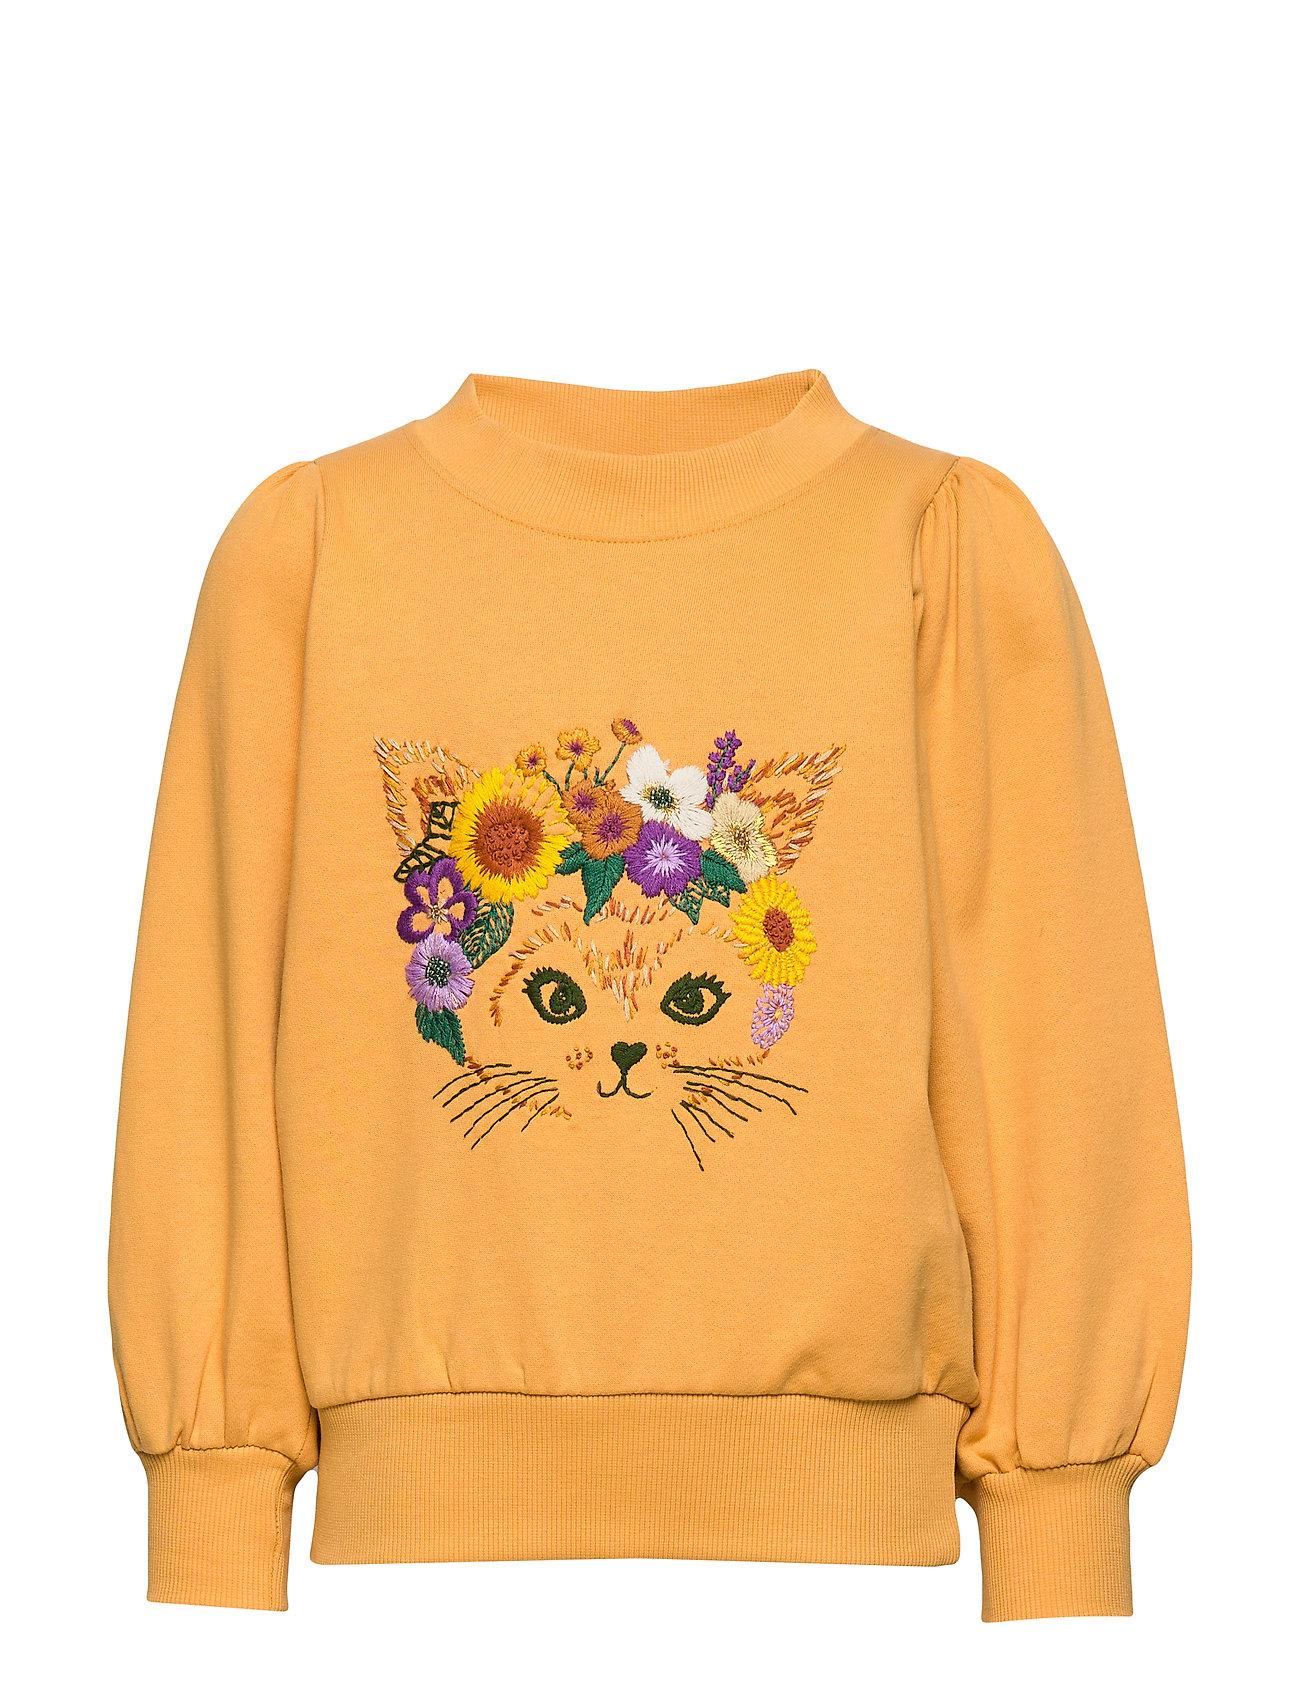 Soft Gallery Era Sweatshirt - GOLDEN APRICOT, FLOWERCAT EMB